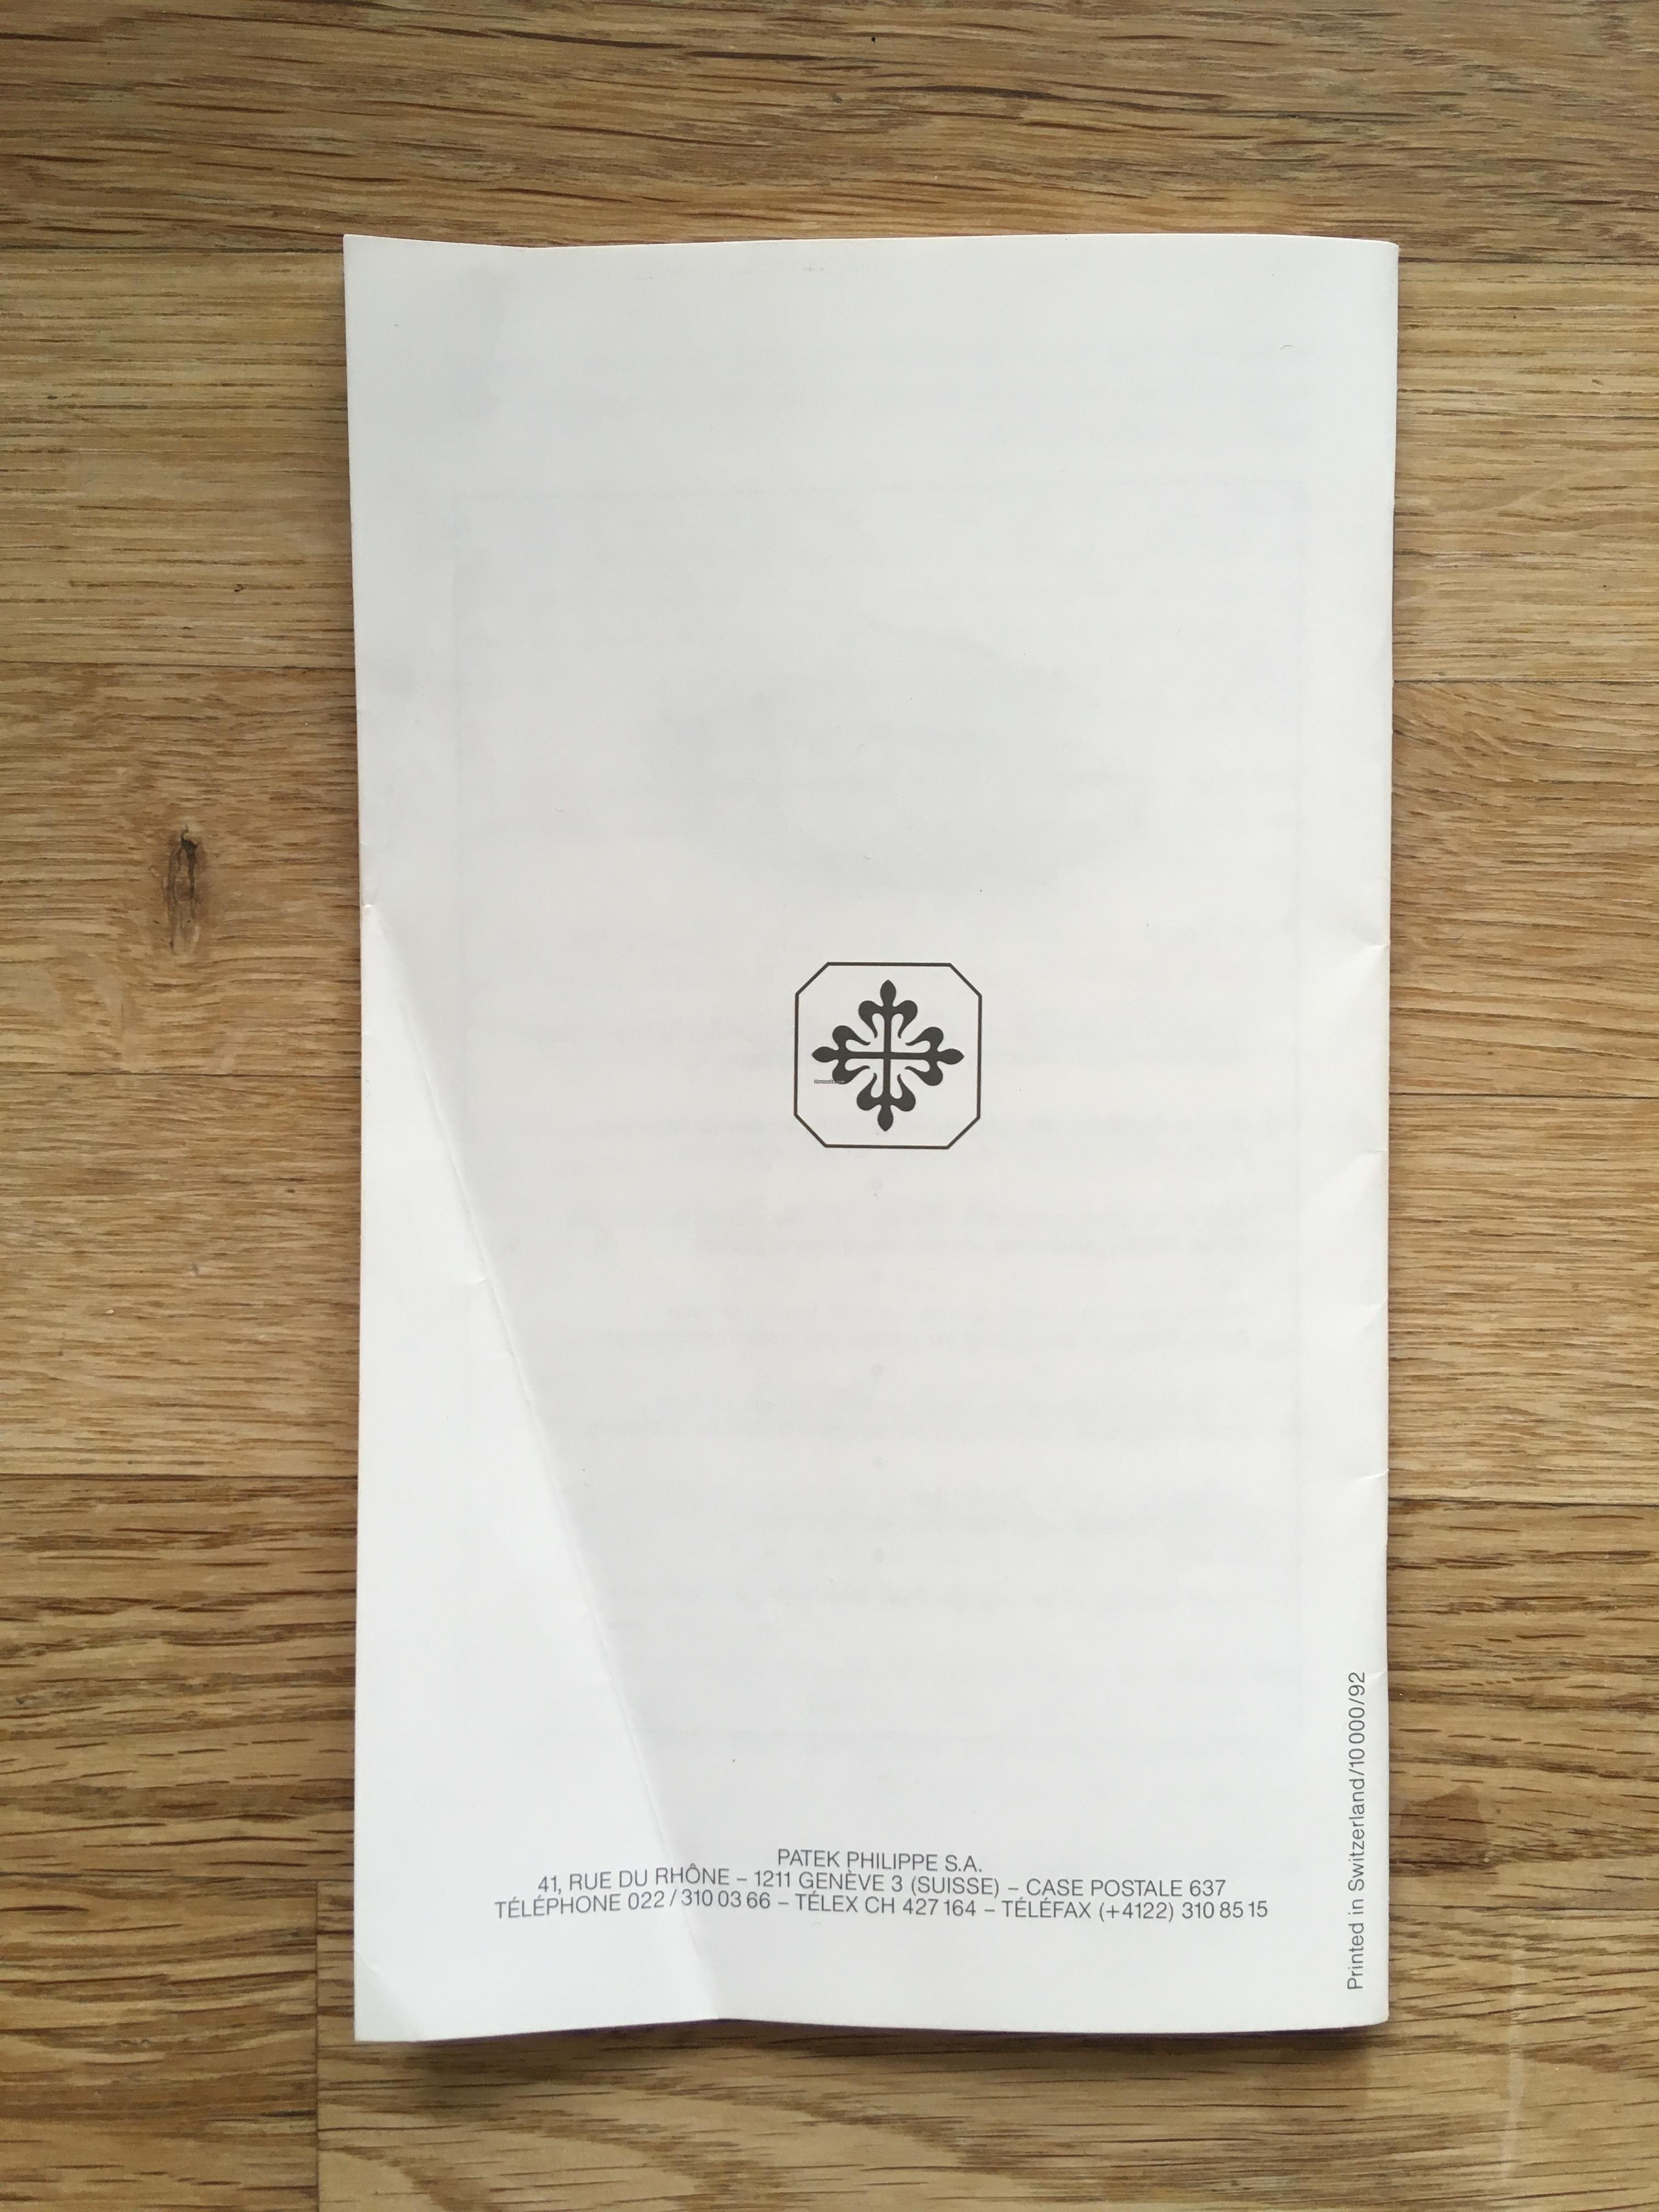 Acalendar Anleitung patek philippe manual anleitung ref. 3448, 3450, 2499 and